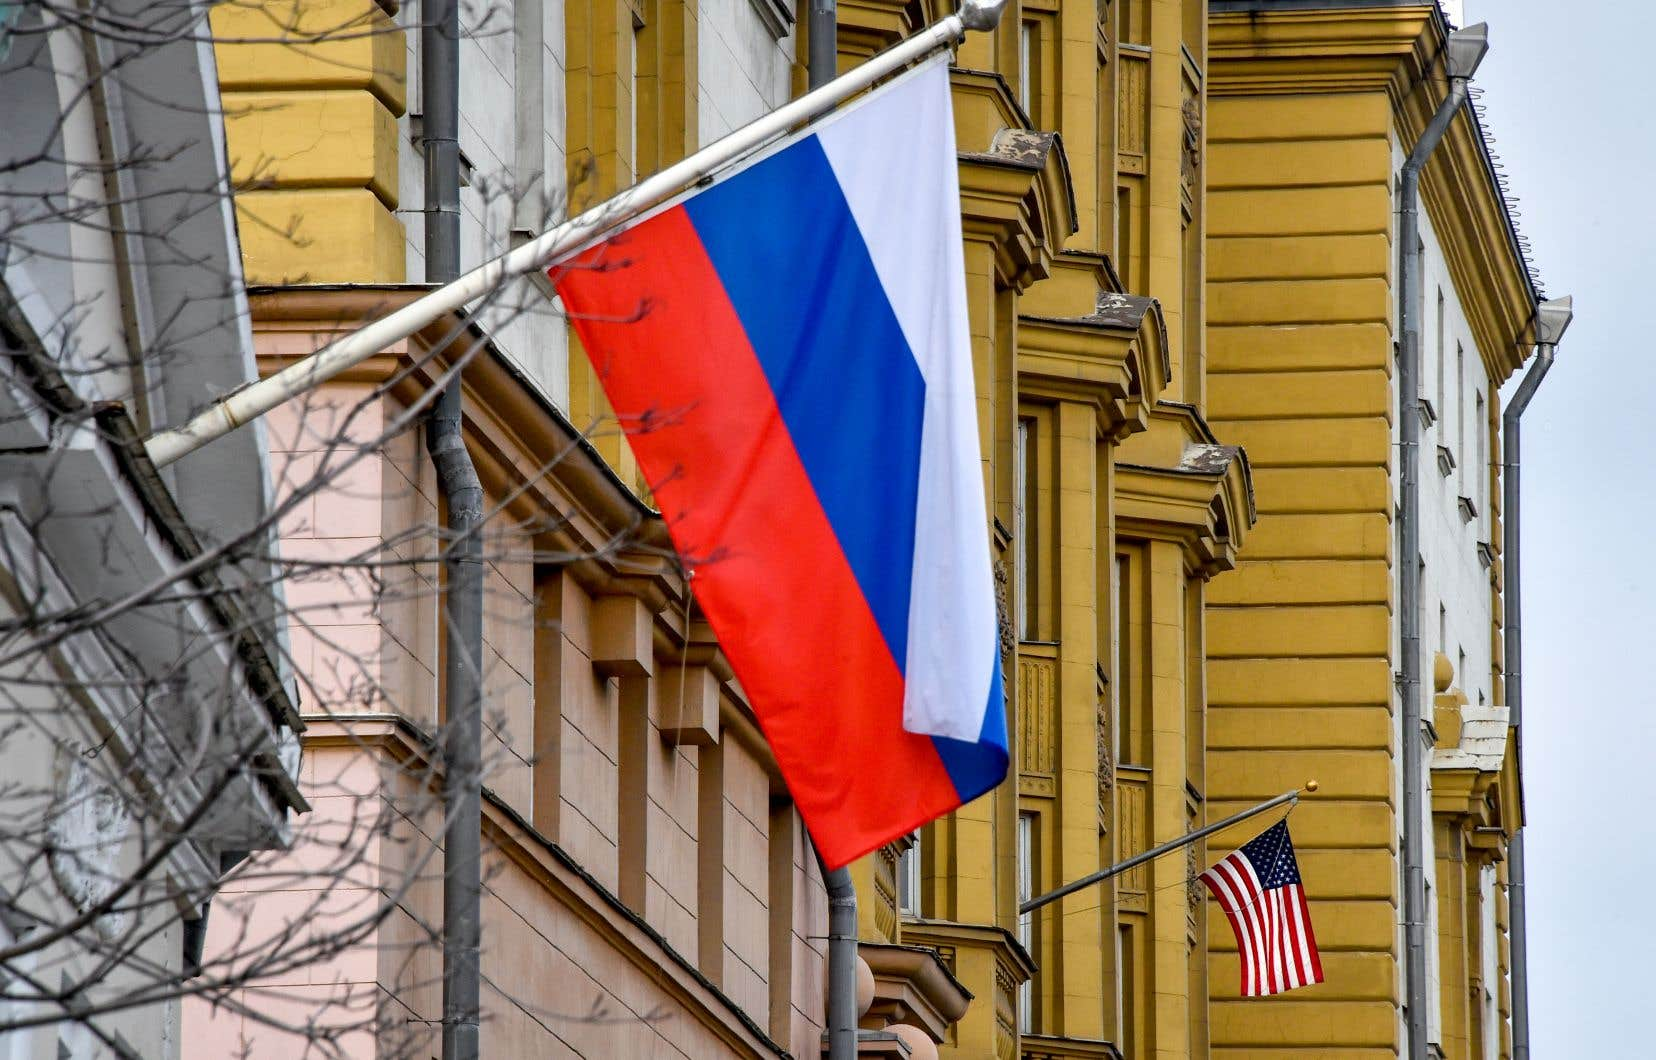 Ambassade des États-Unis à Moscou